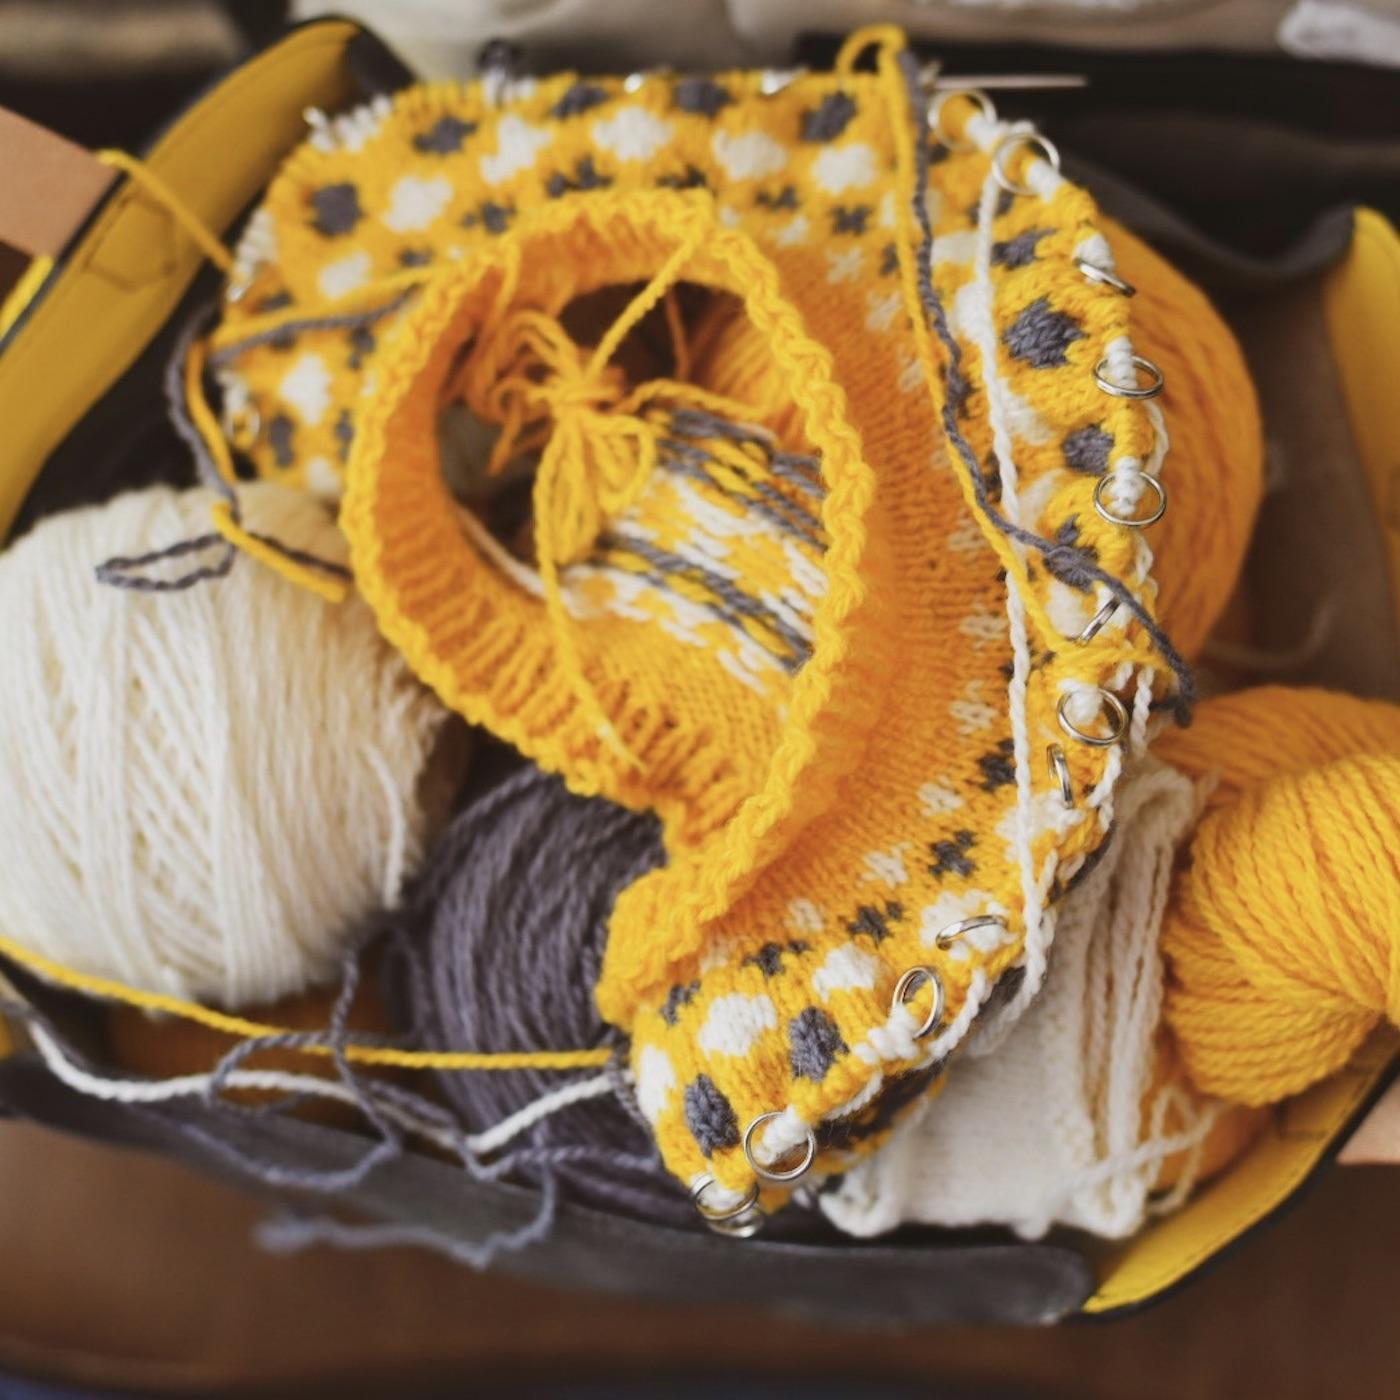 Vibranium Knitting Needles- Episode 628- The Knitmore Girls